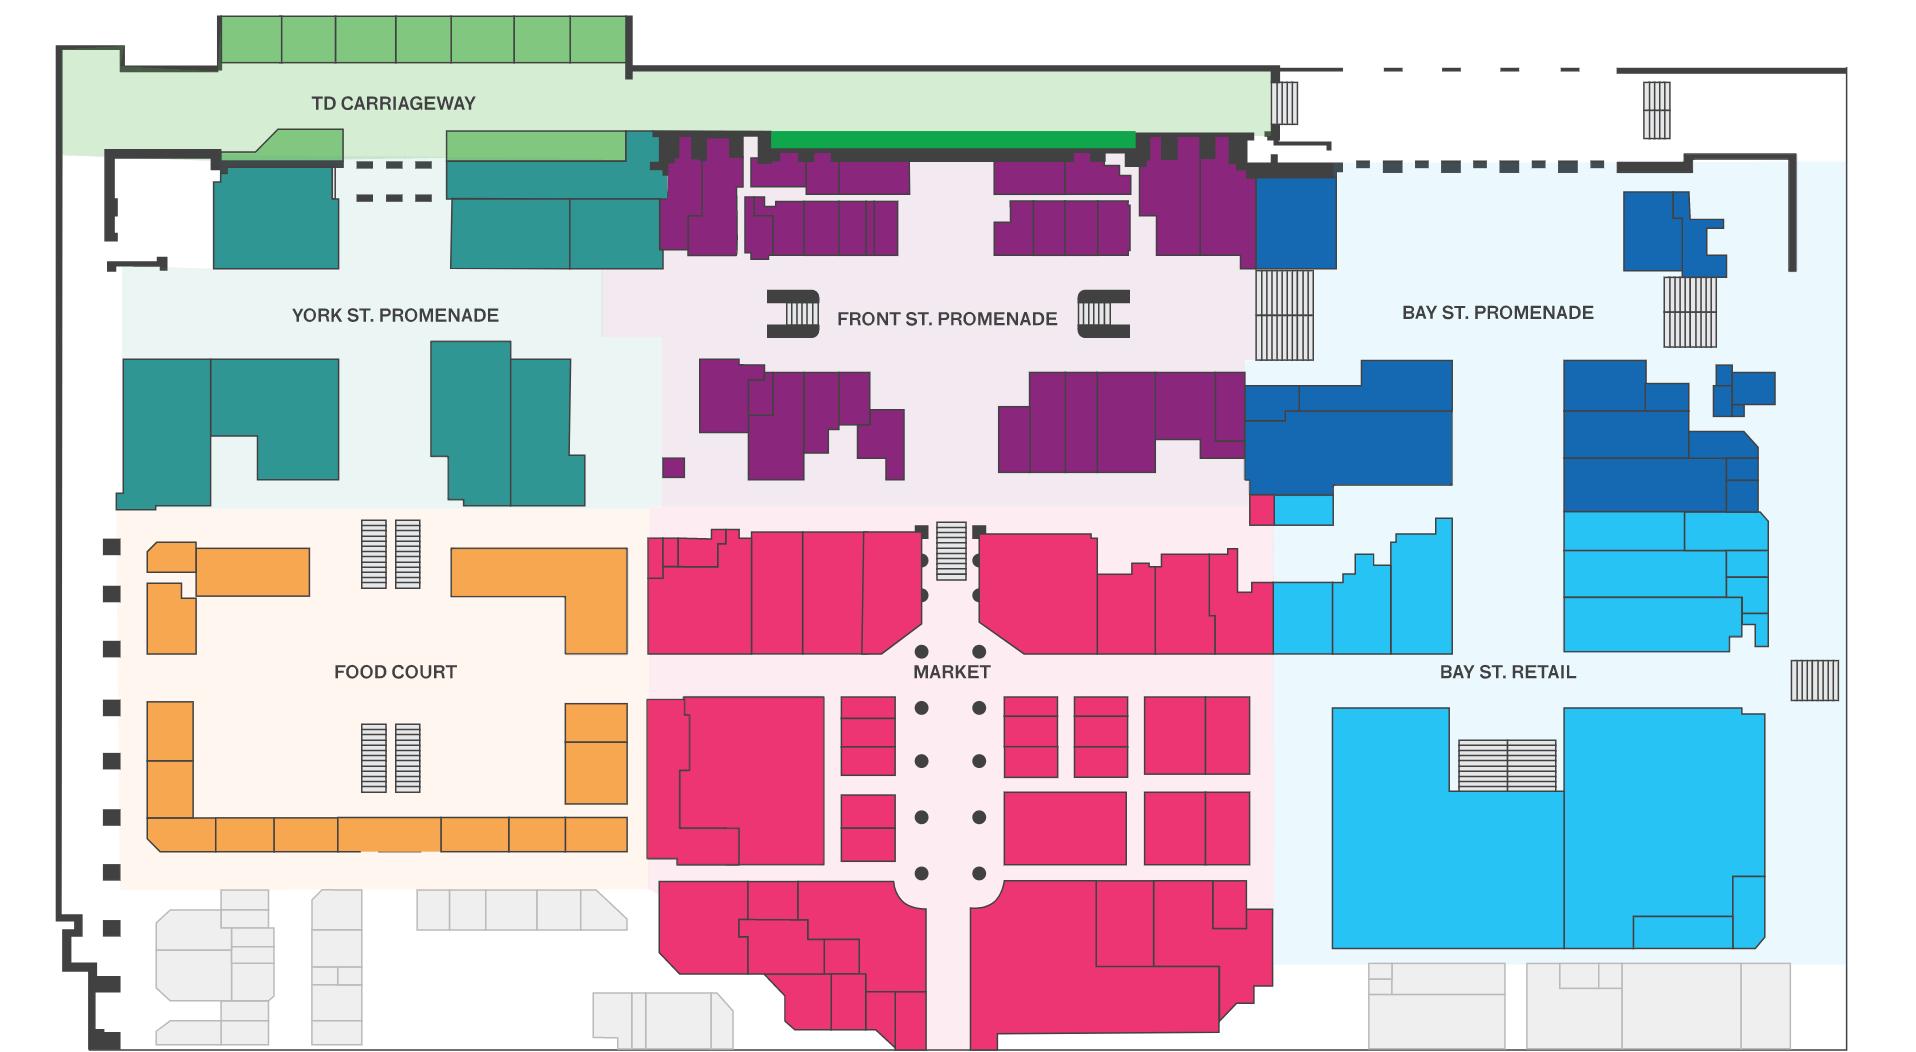 Toronto Union Station map lower level